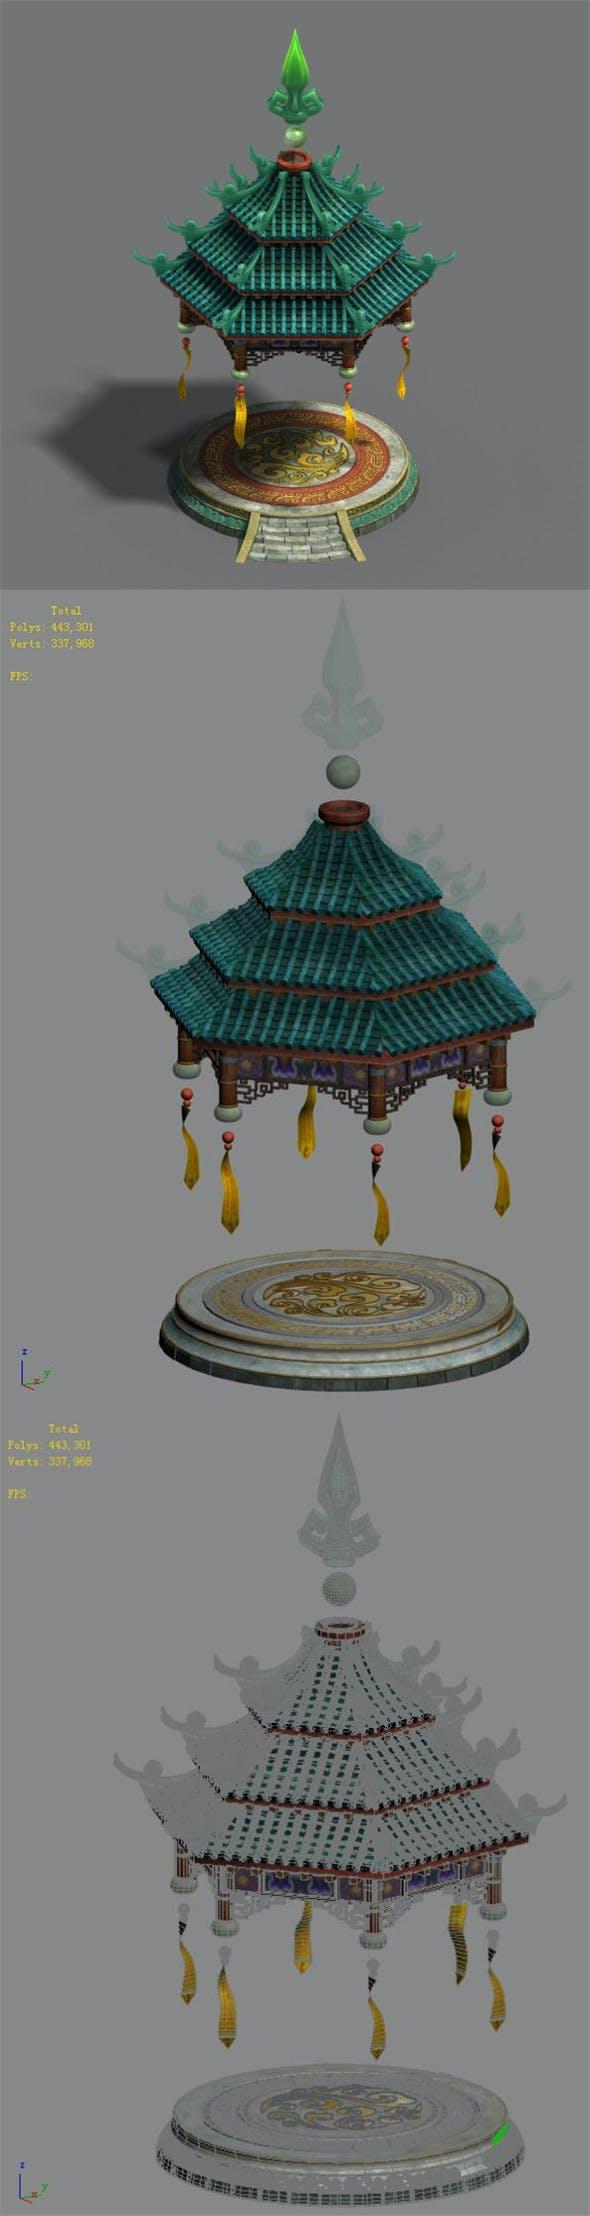 Shushan - small pavilion - 3DOcean Item for Sale